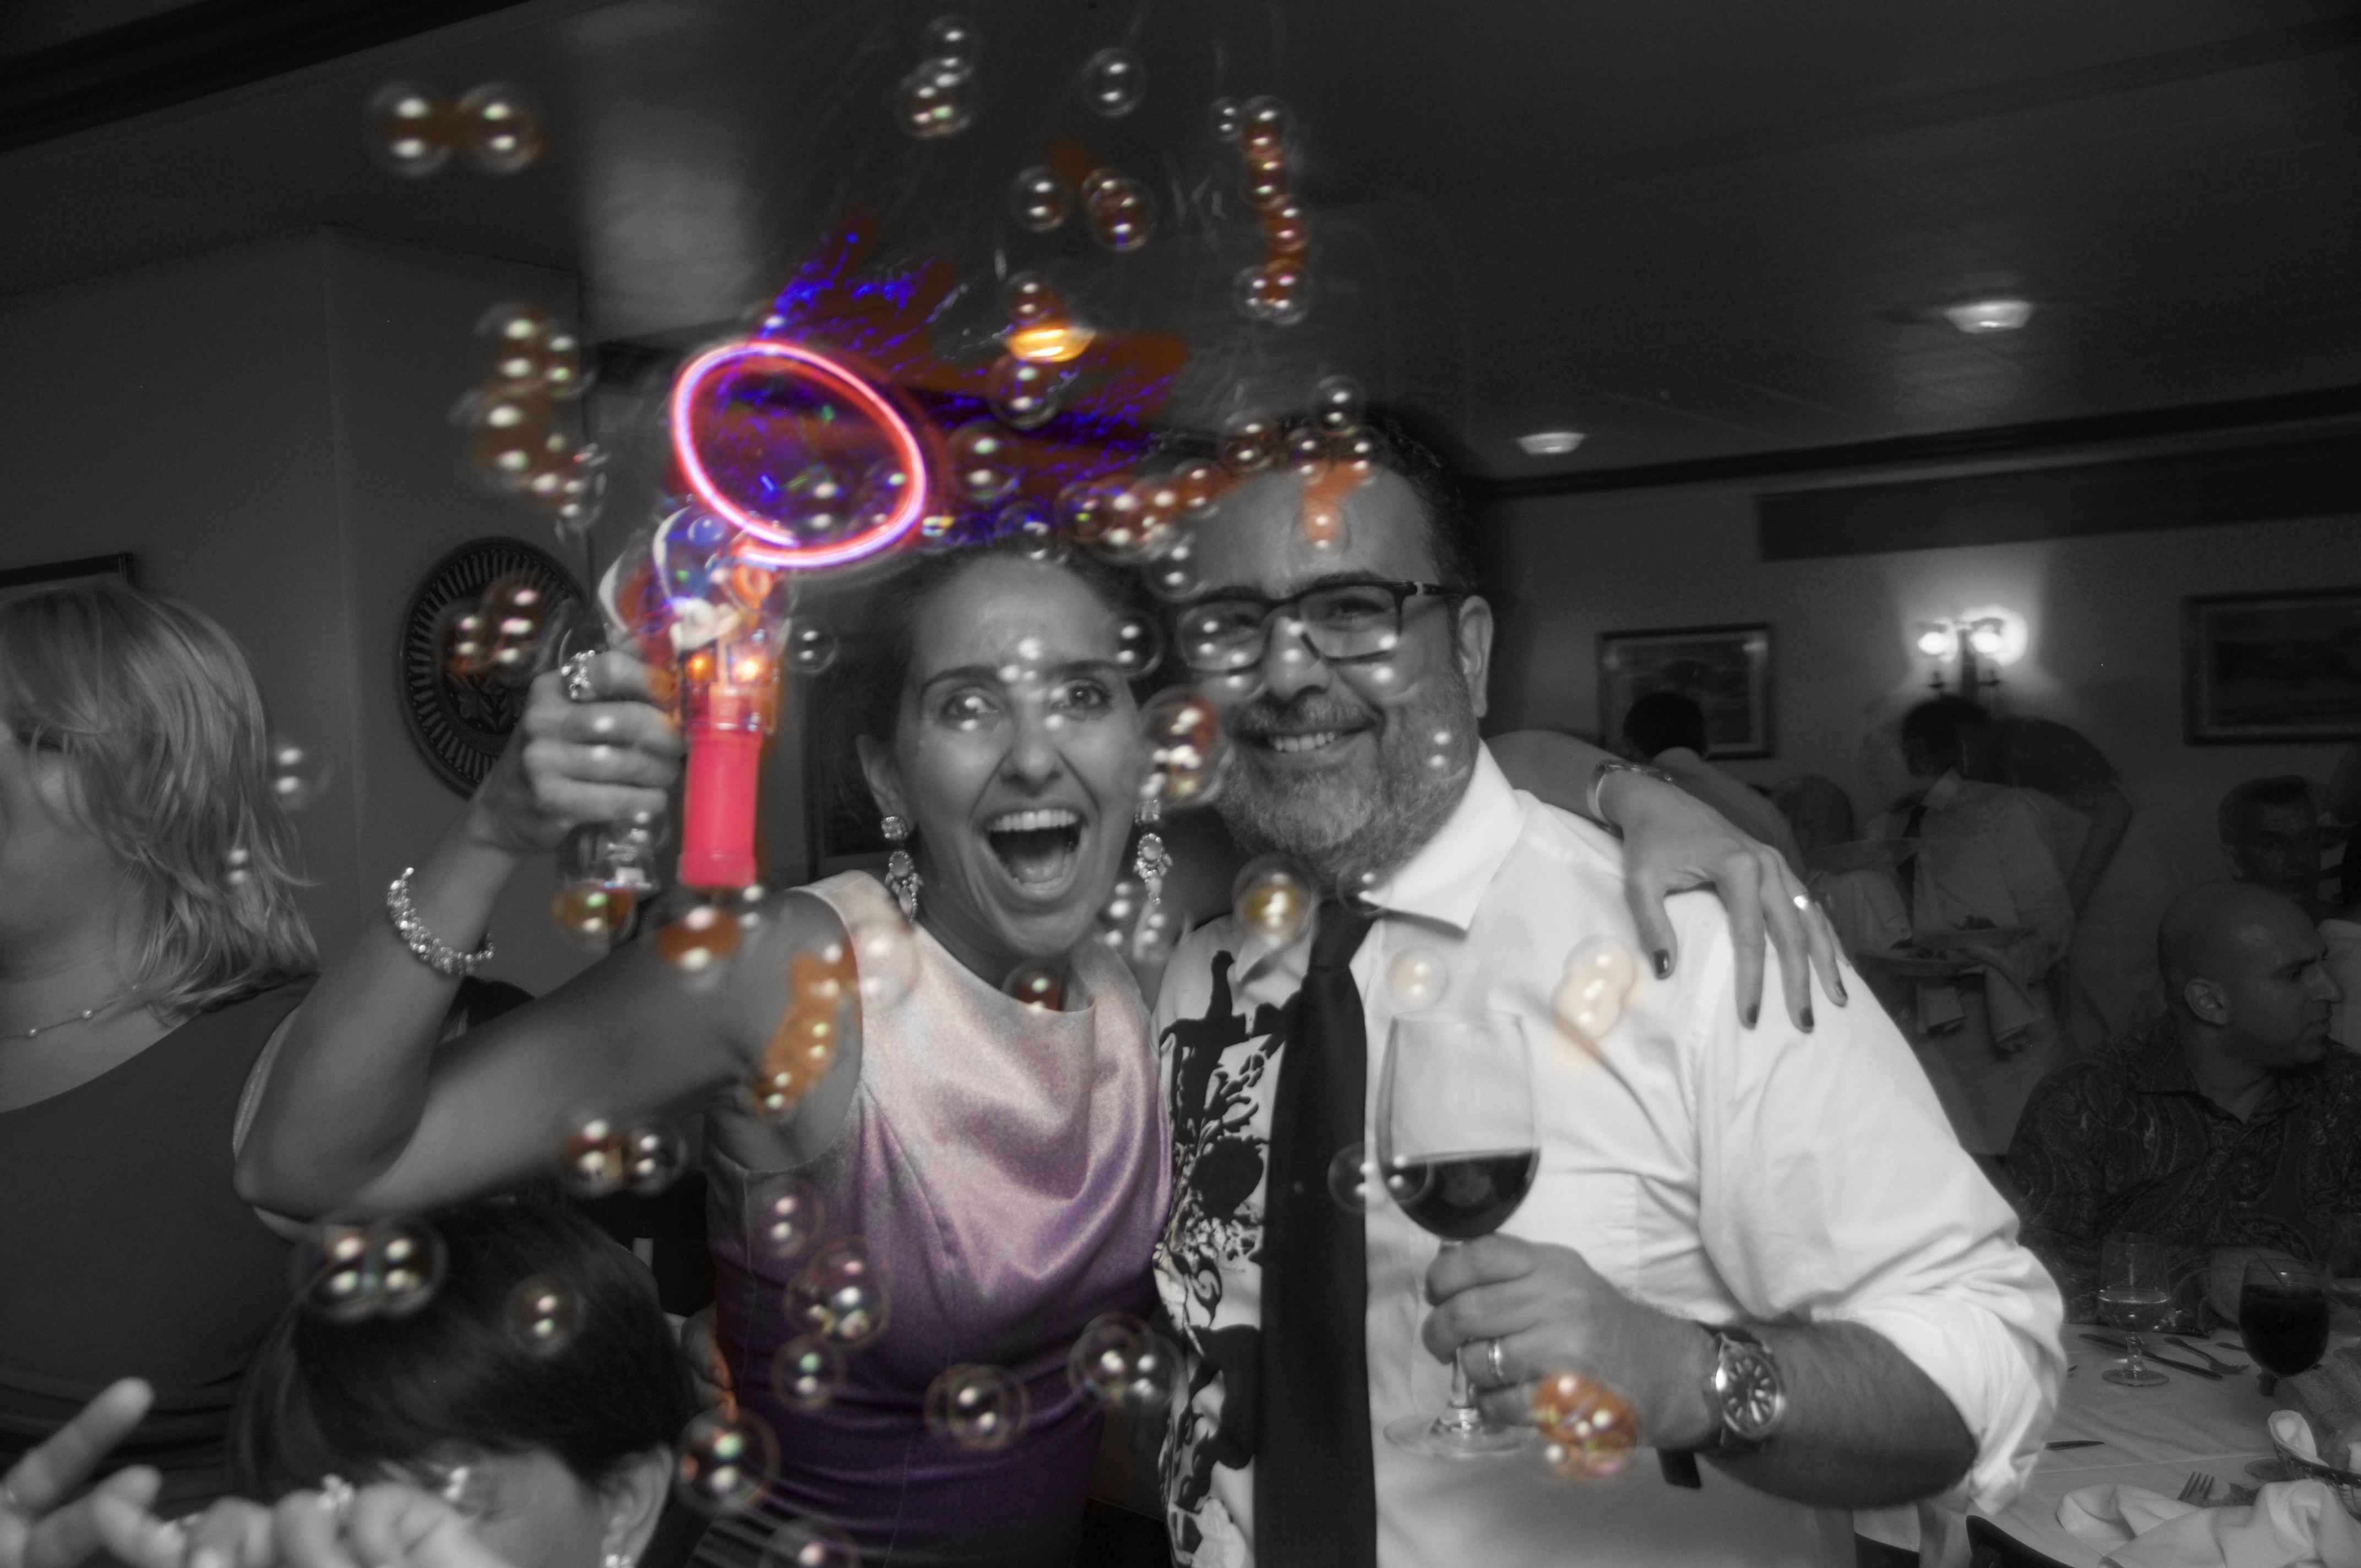 Nana & Ricardo + bubbles